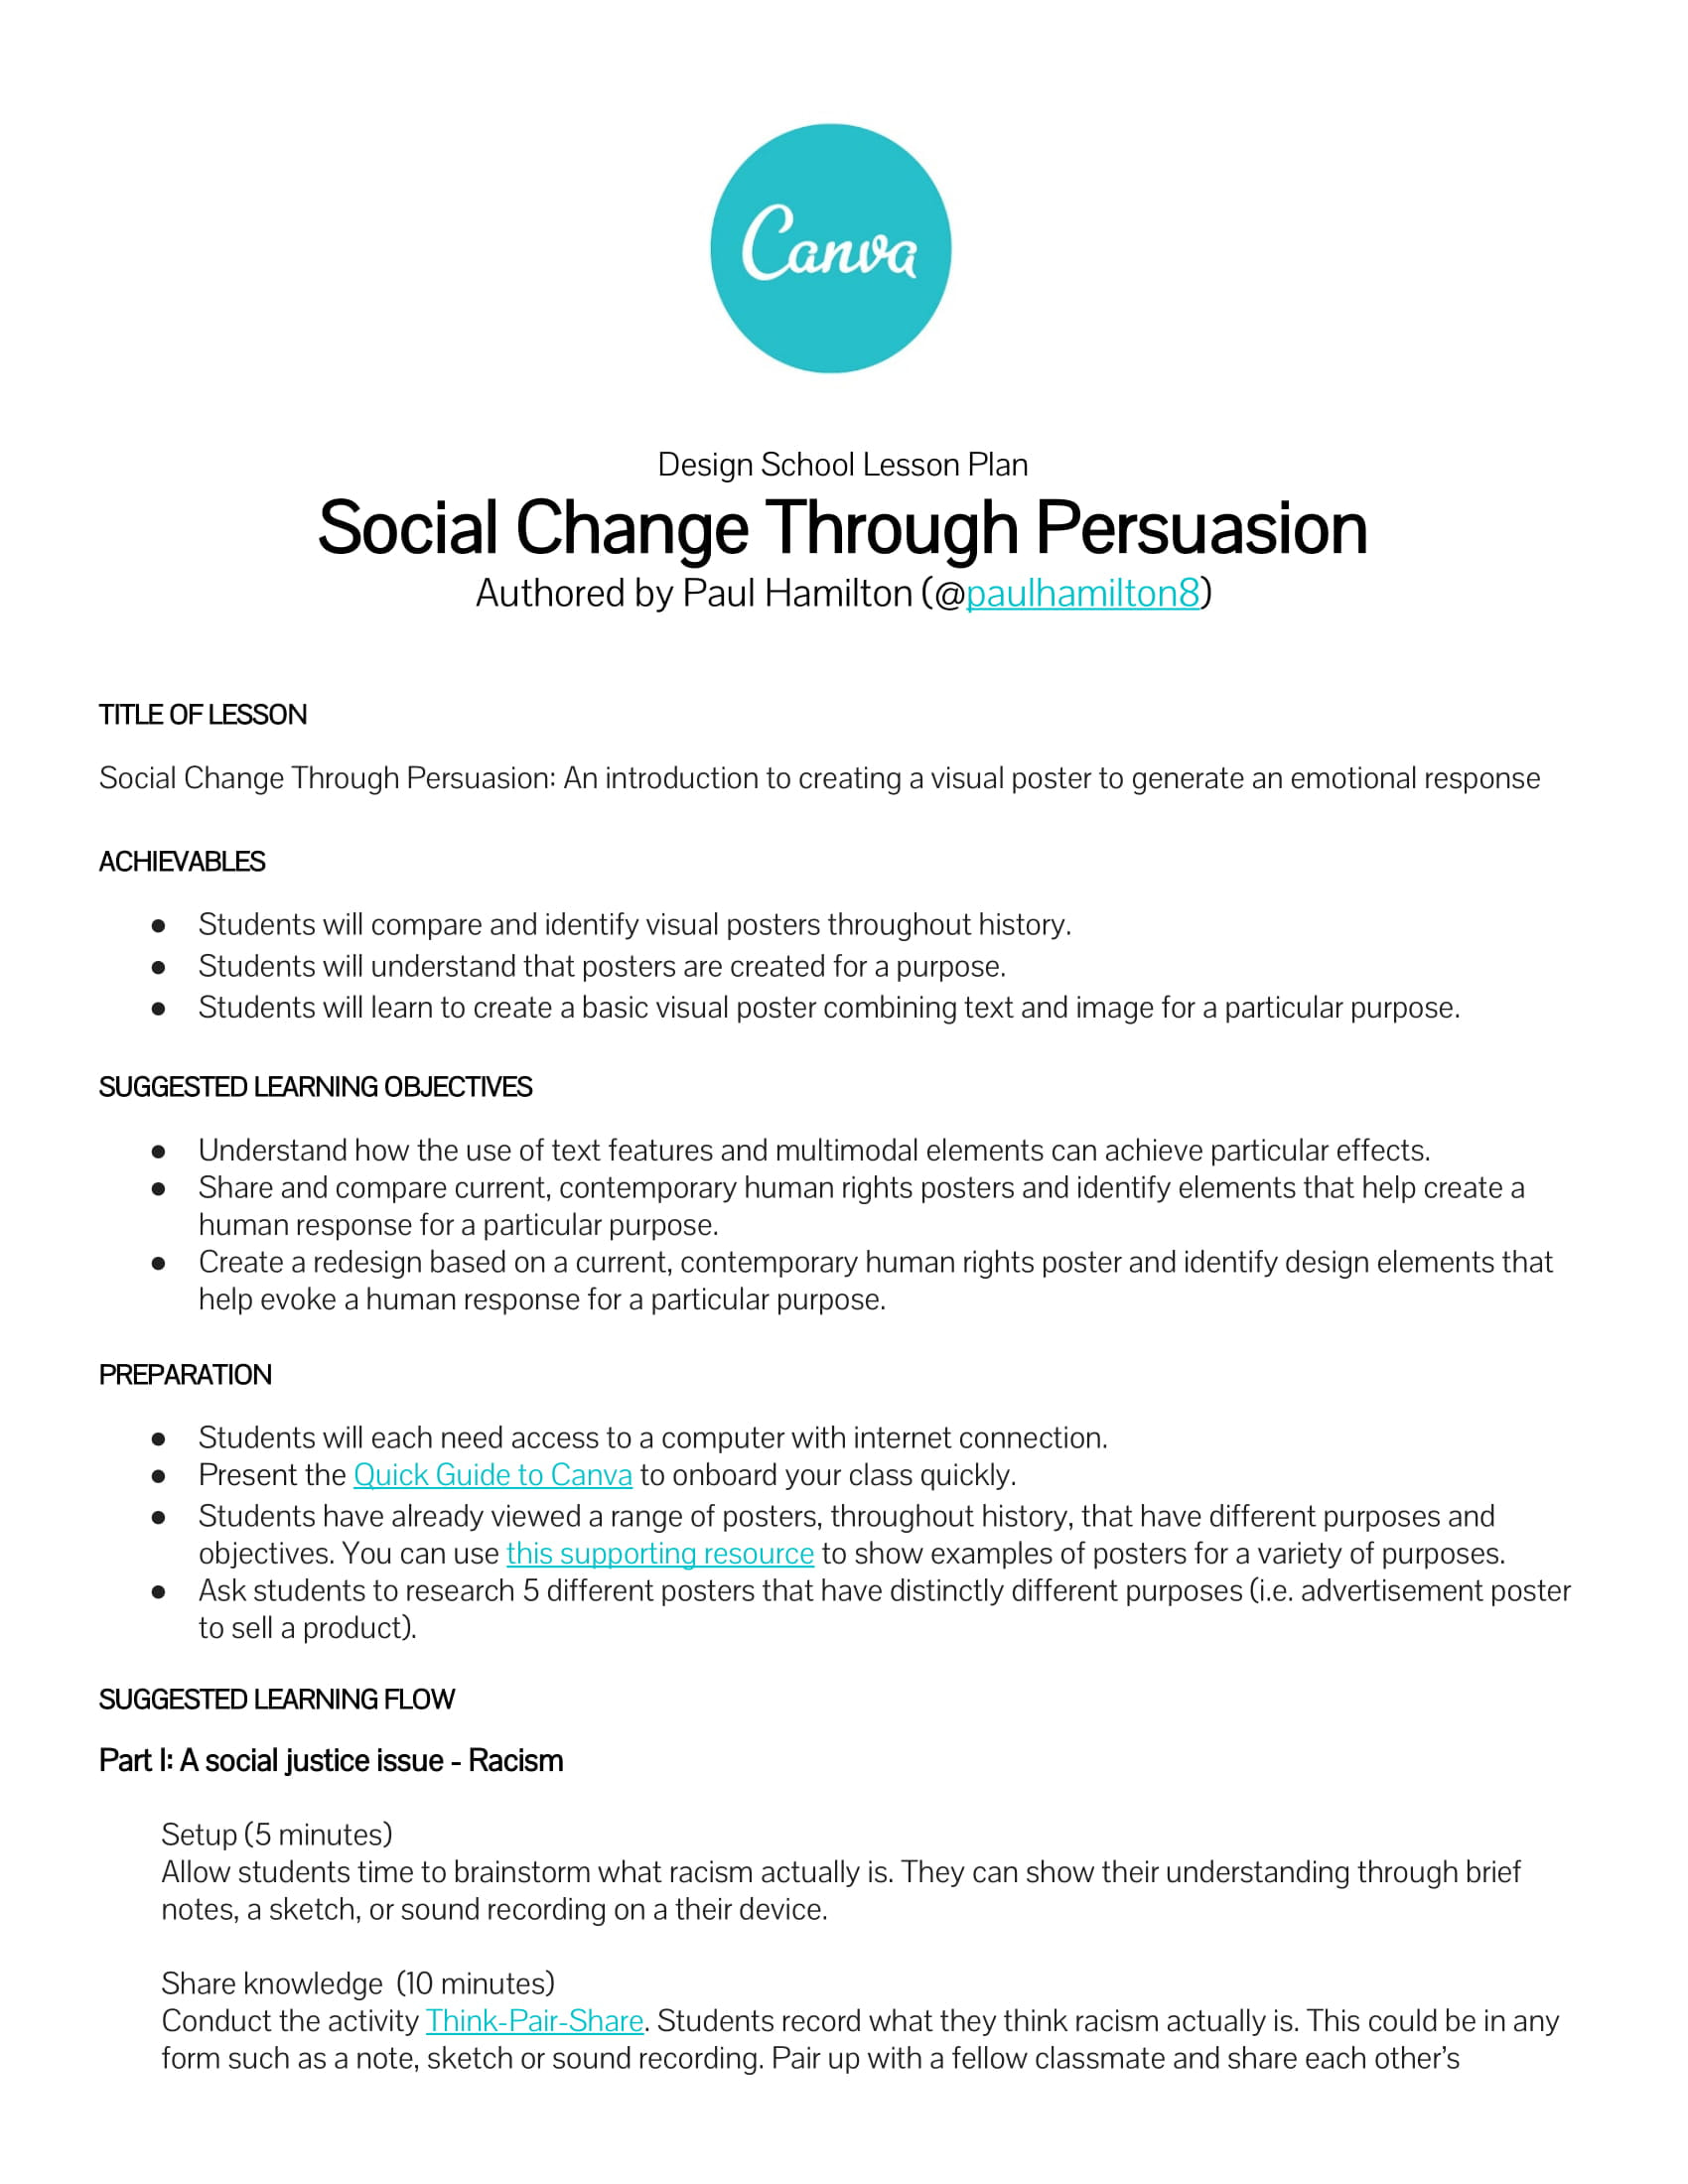 Social Change Through Persuasion lesson plan